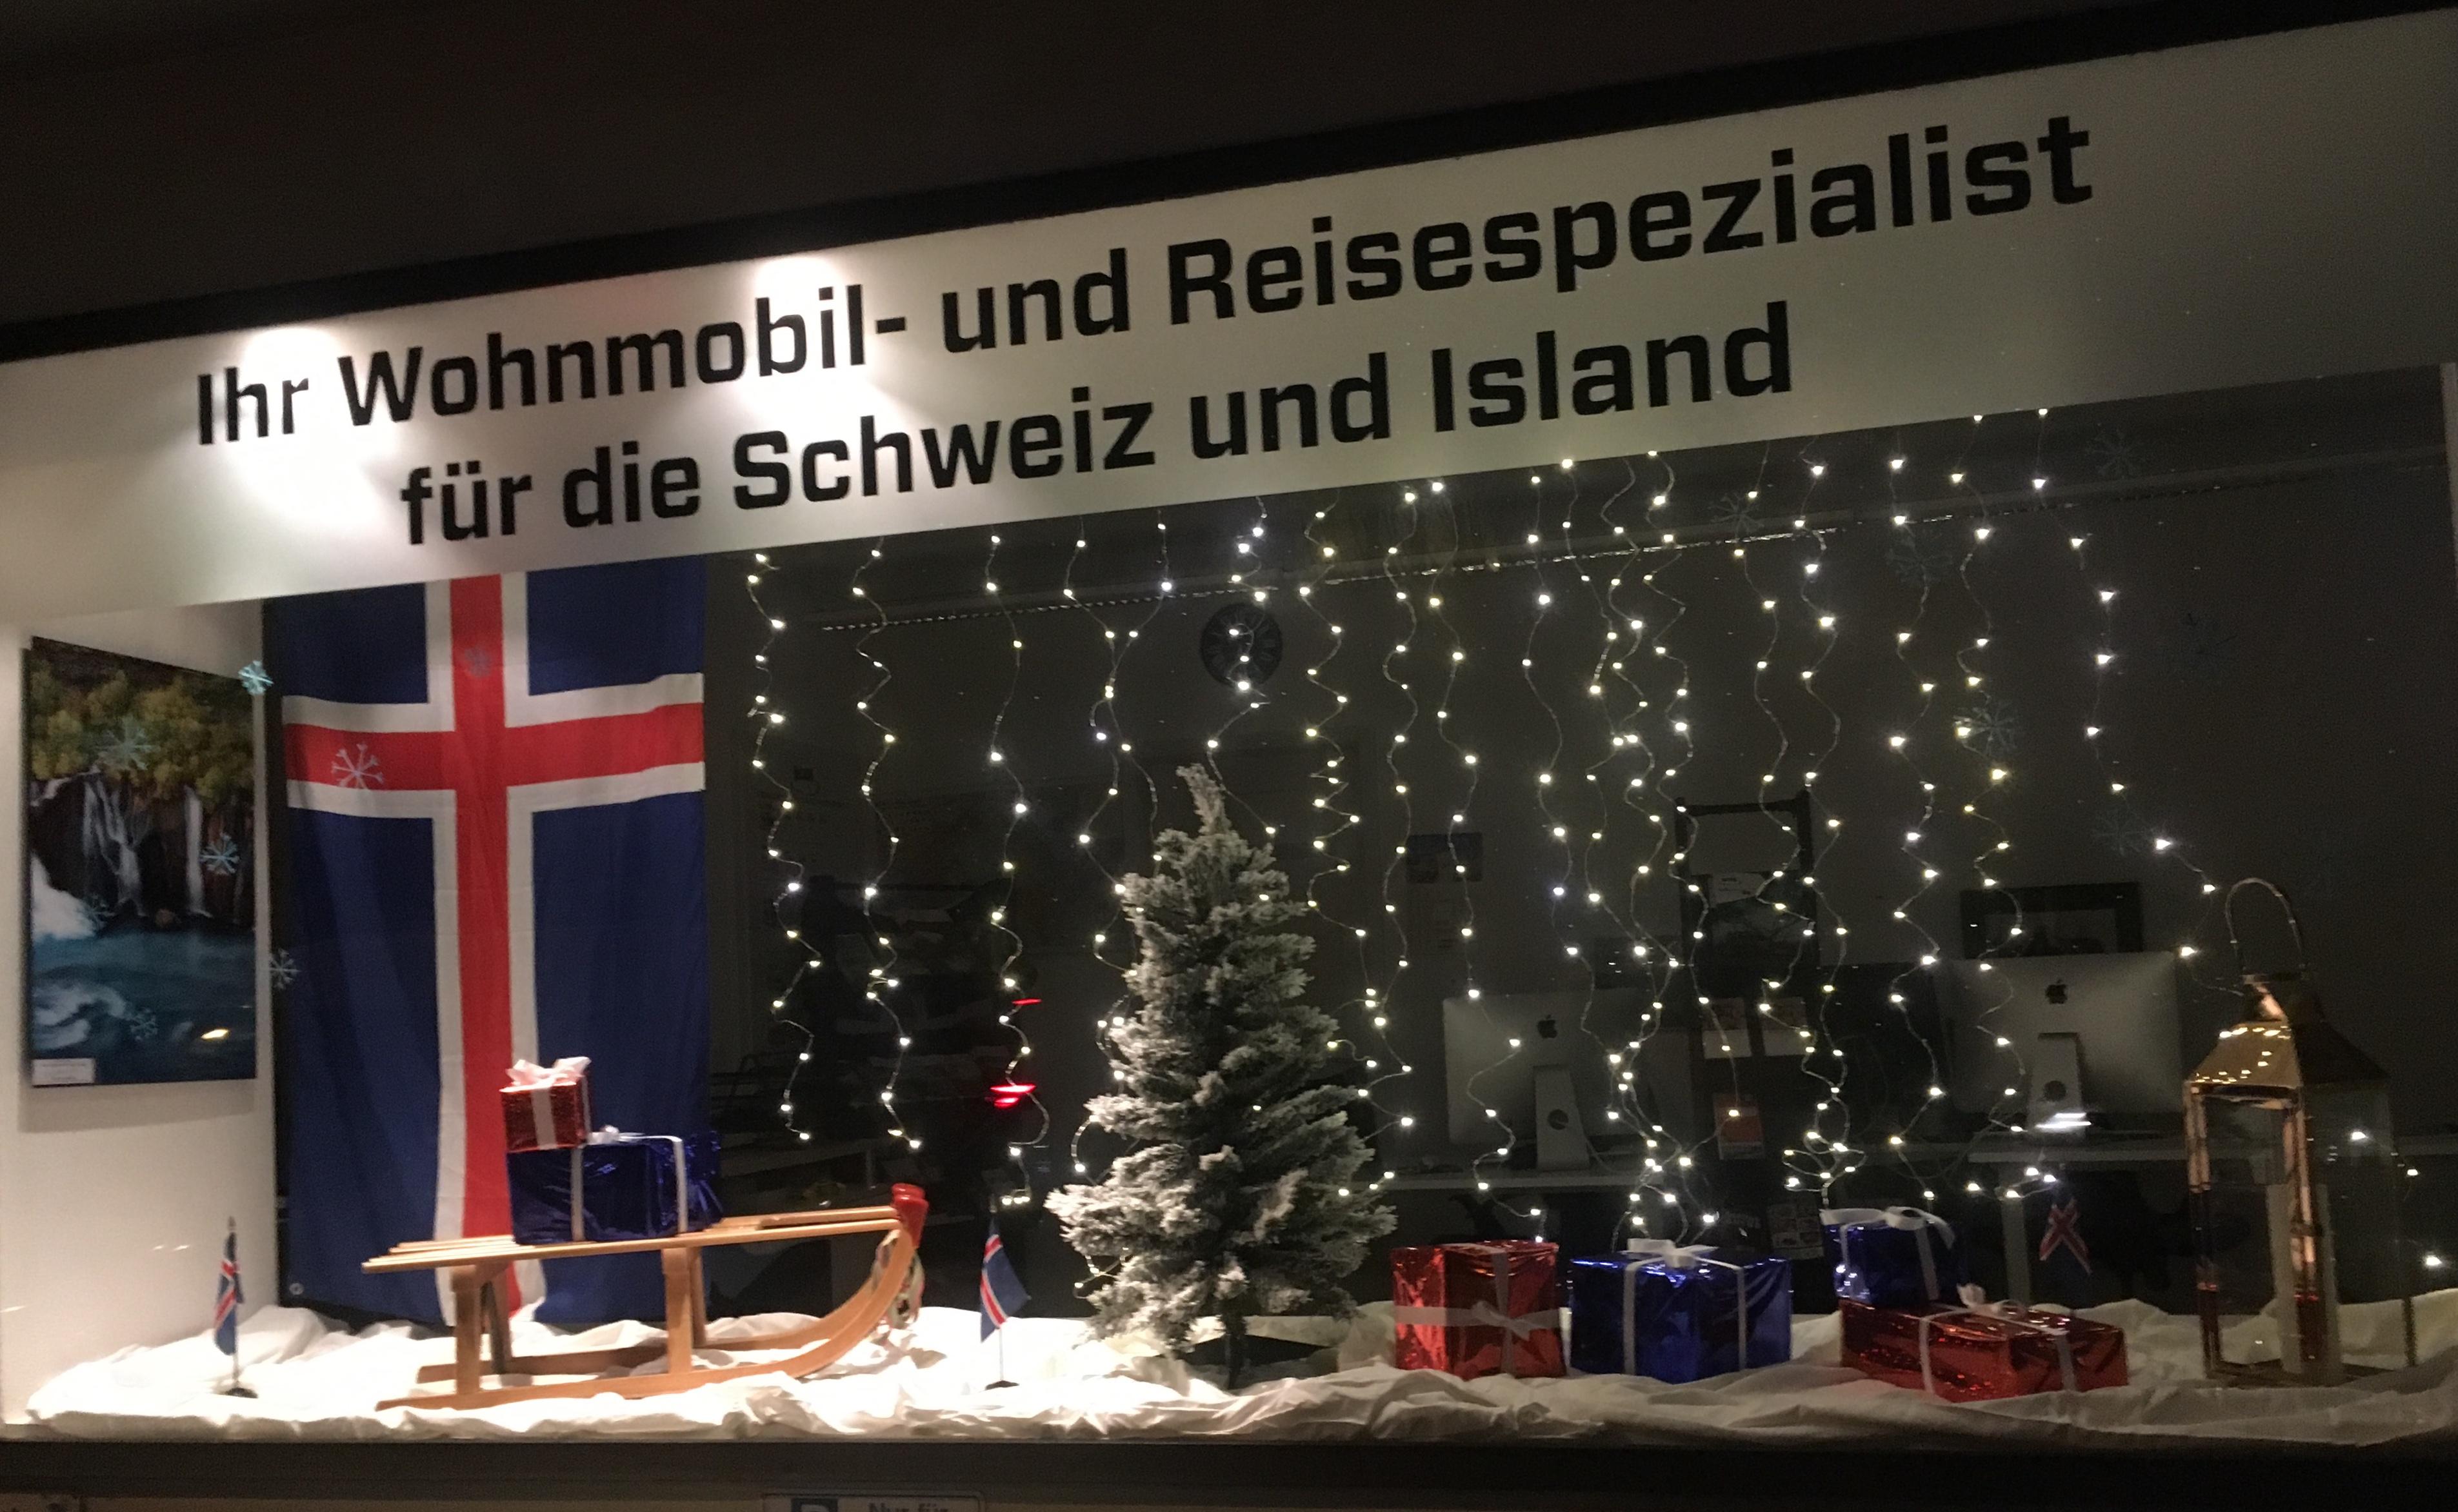 Our Christmas Window in Gebenstorf